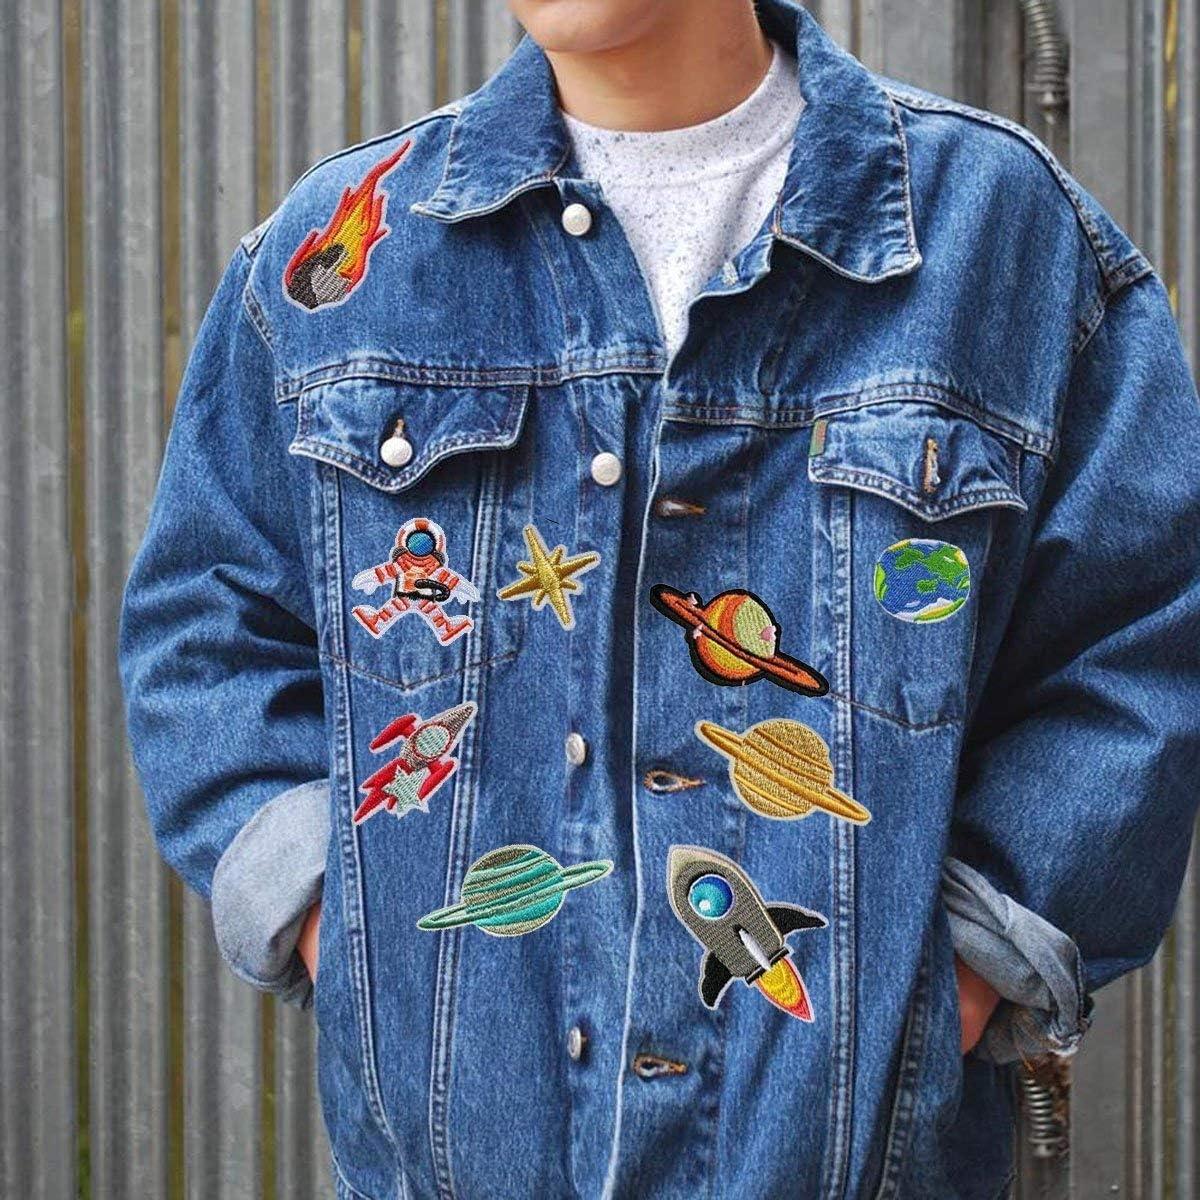 Car Parche de Ropa Parches Ropa Termoadhesivos Cute DIY Ropa Parches para la camiseta Jeans Ropa Bolsas Patch Sticker Sunshine-Smile 16 Pcs Coche Apliques